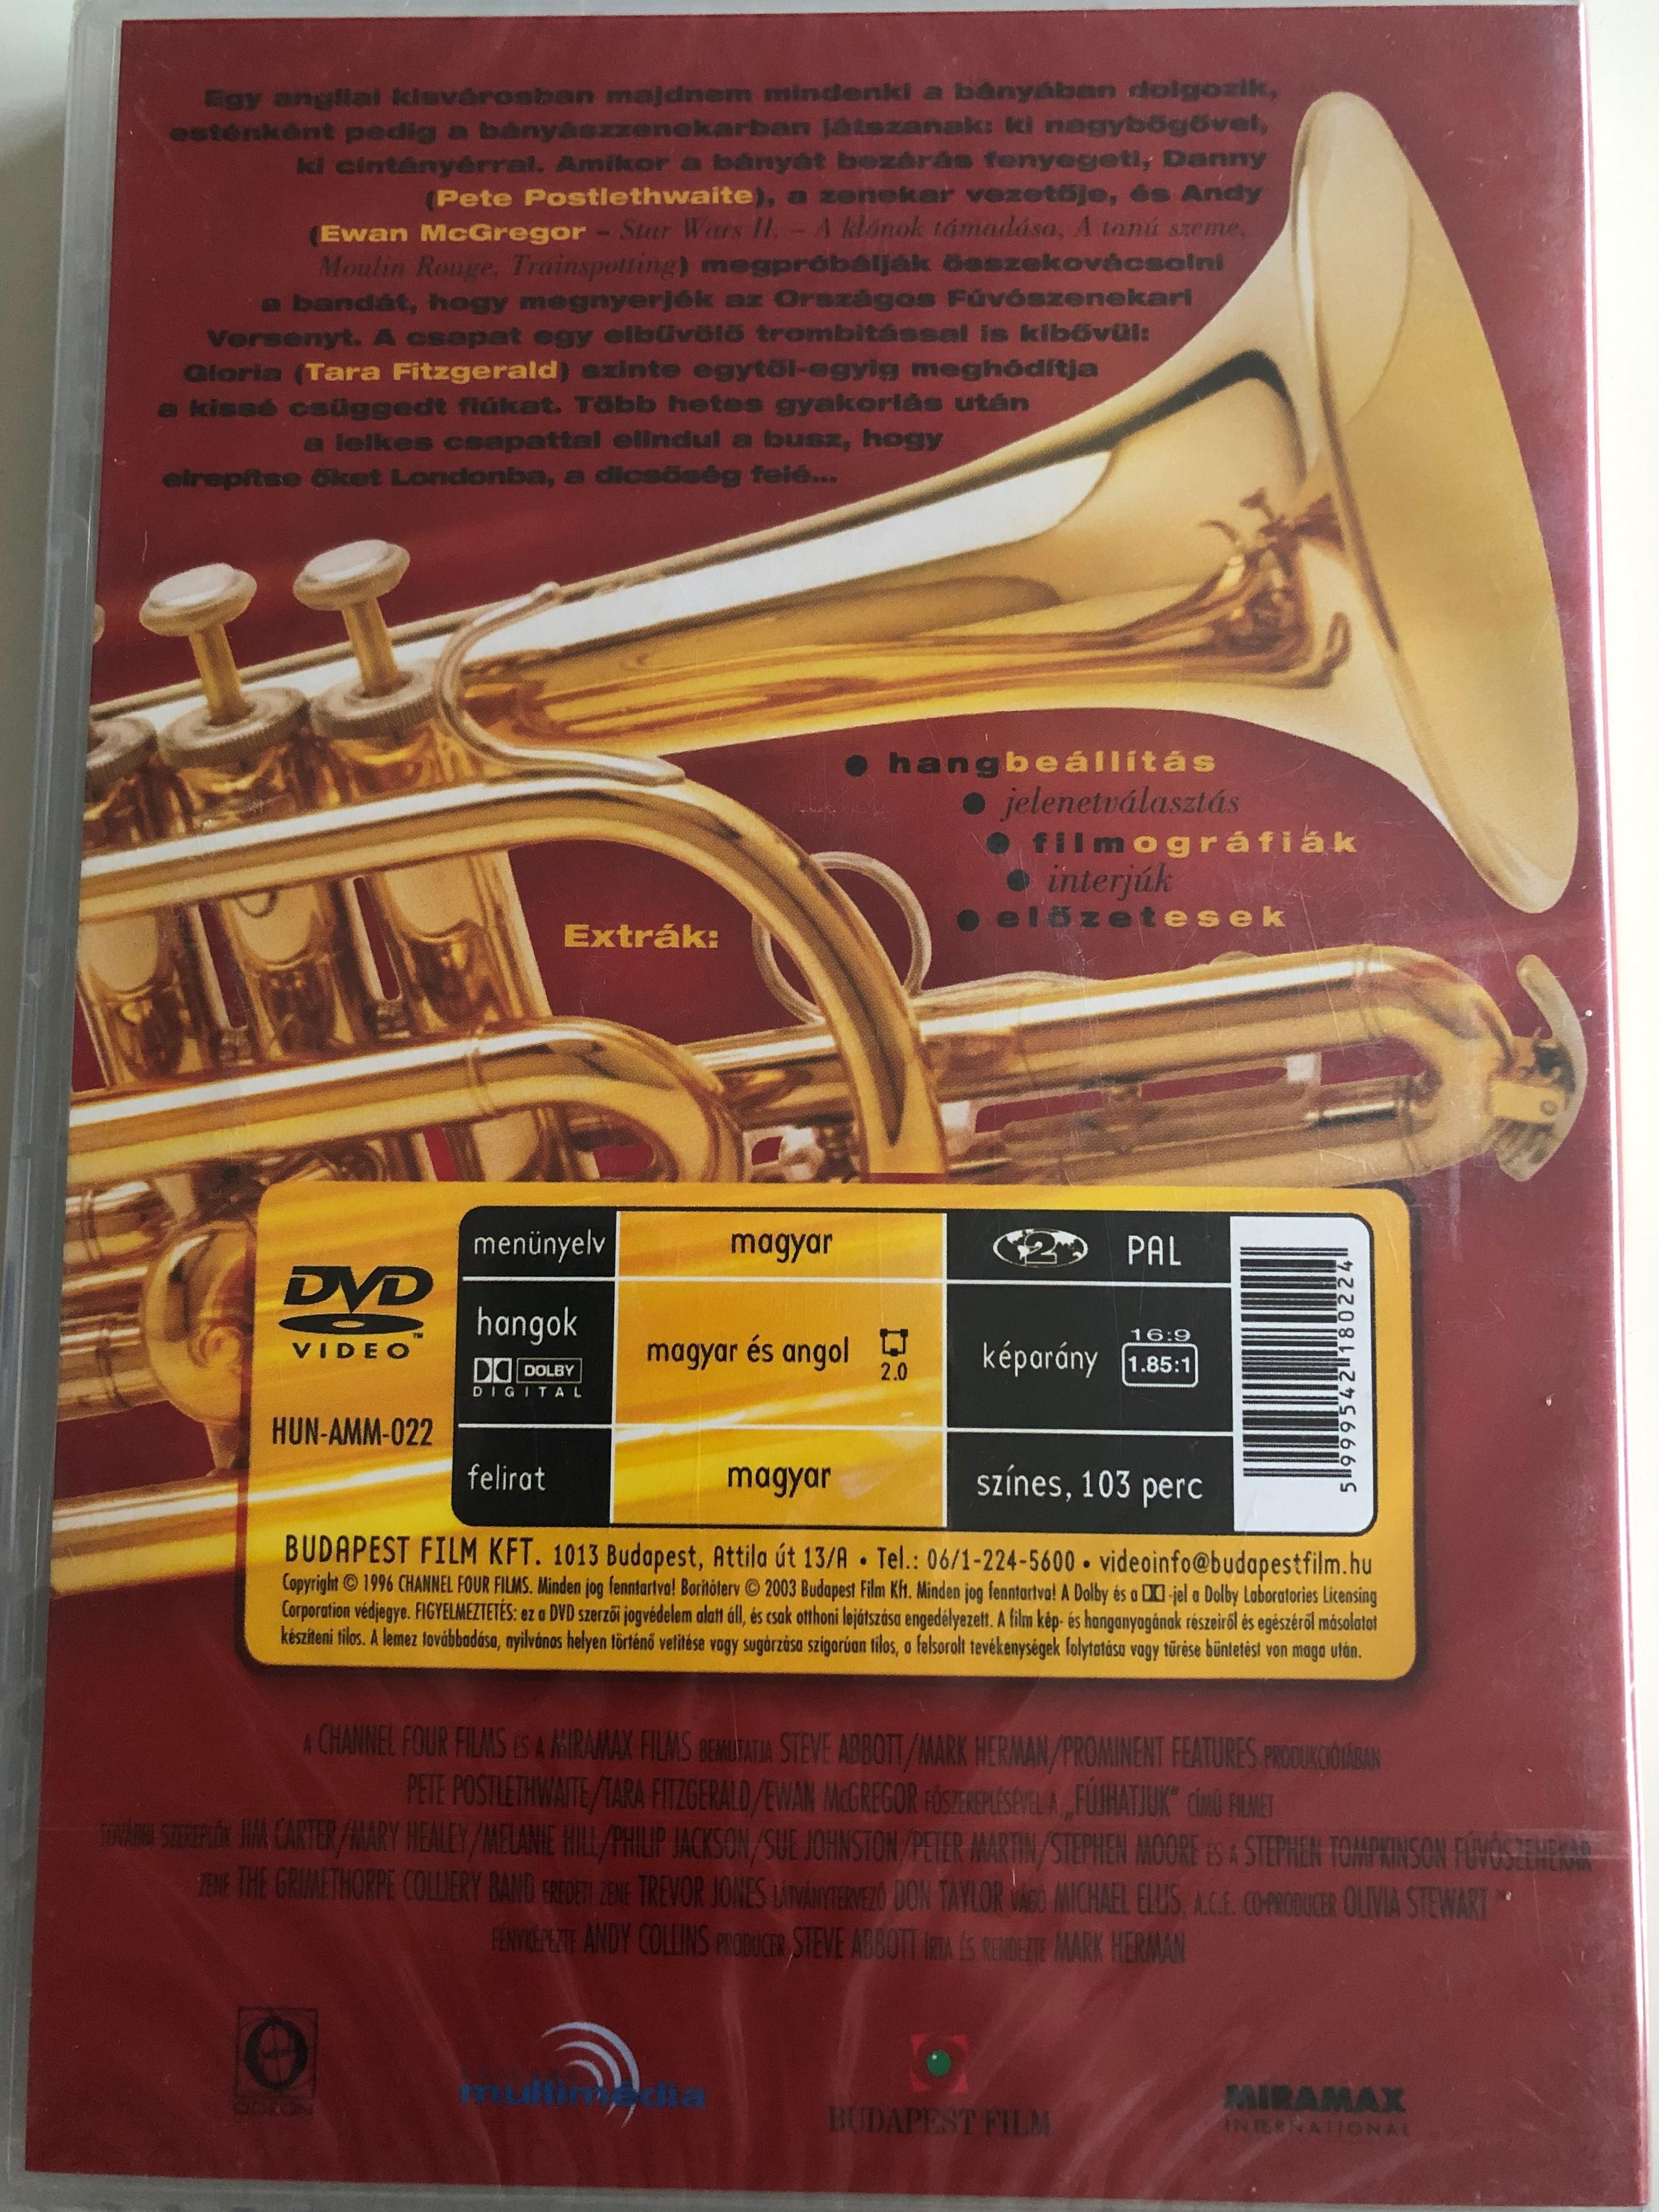 brassed-off-dvd-1996-f-jhatjuk-directed-by-mark-herman-2.jpg